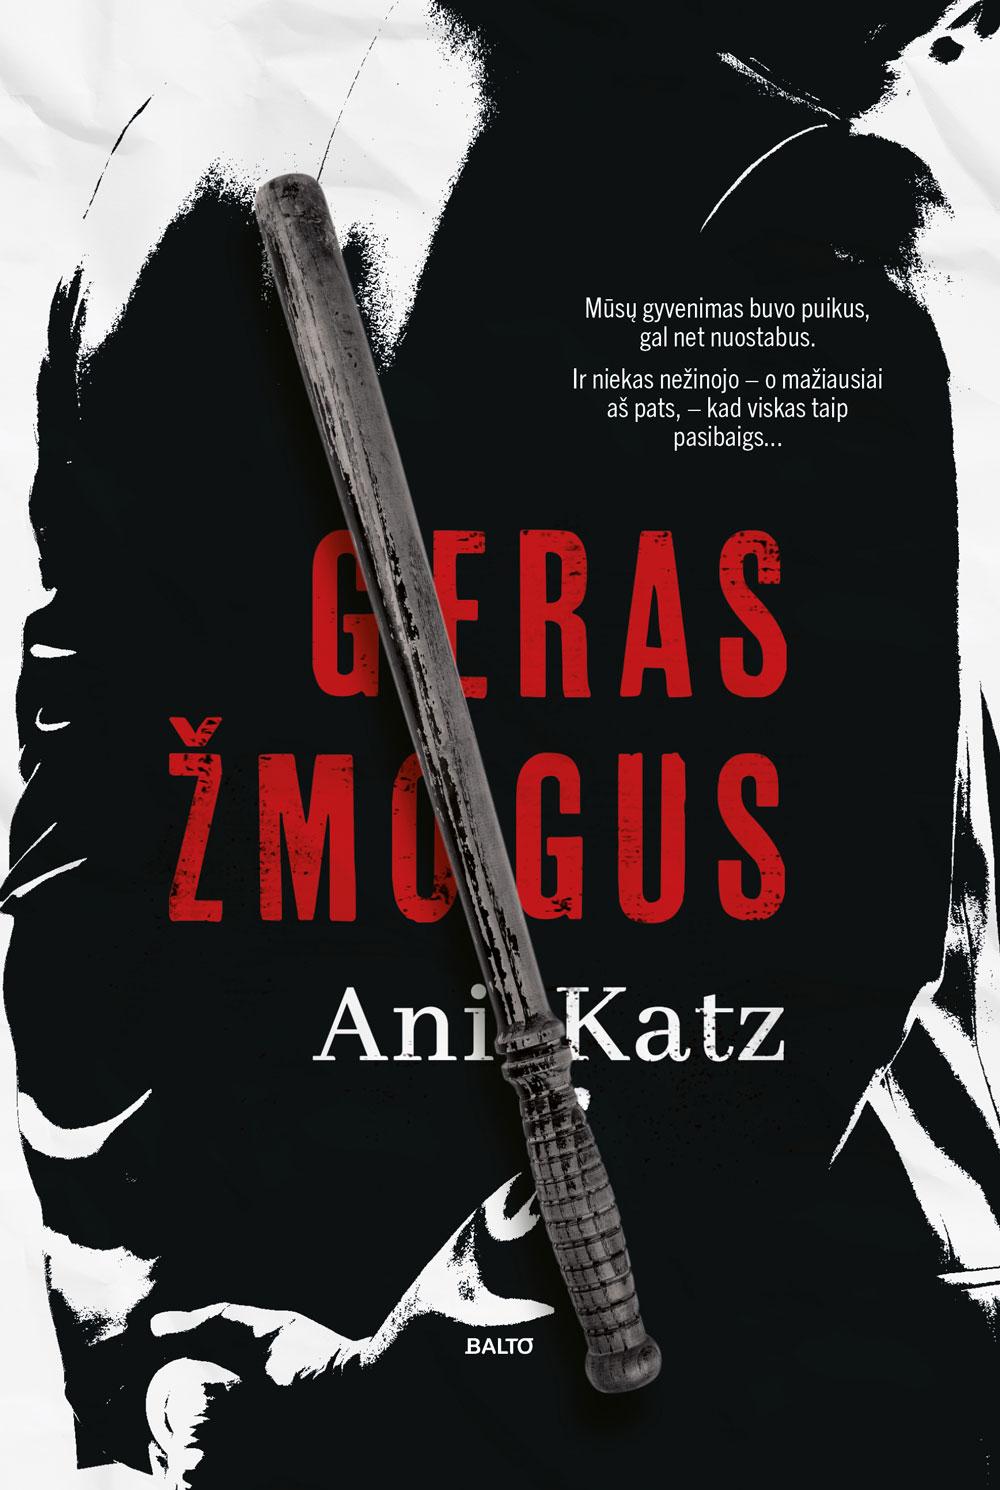 Geras žmogus - Ani Katz, Balto leidybos namai